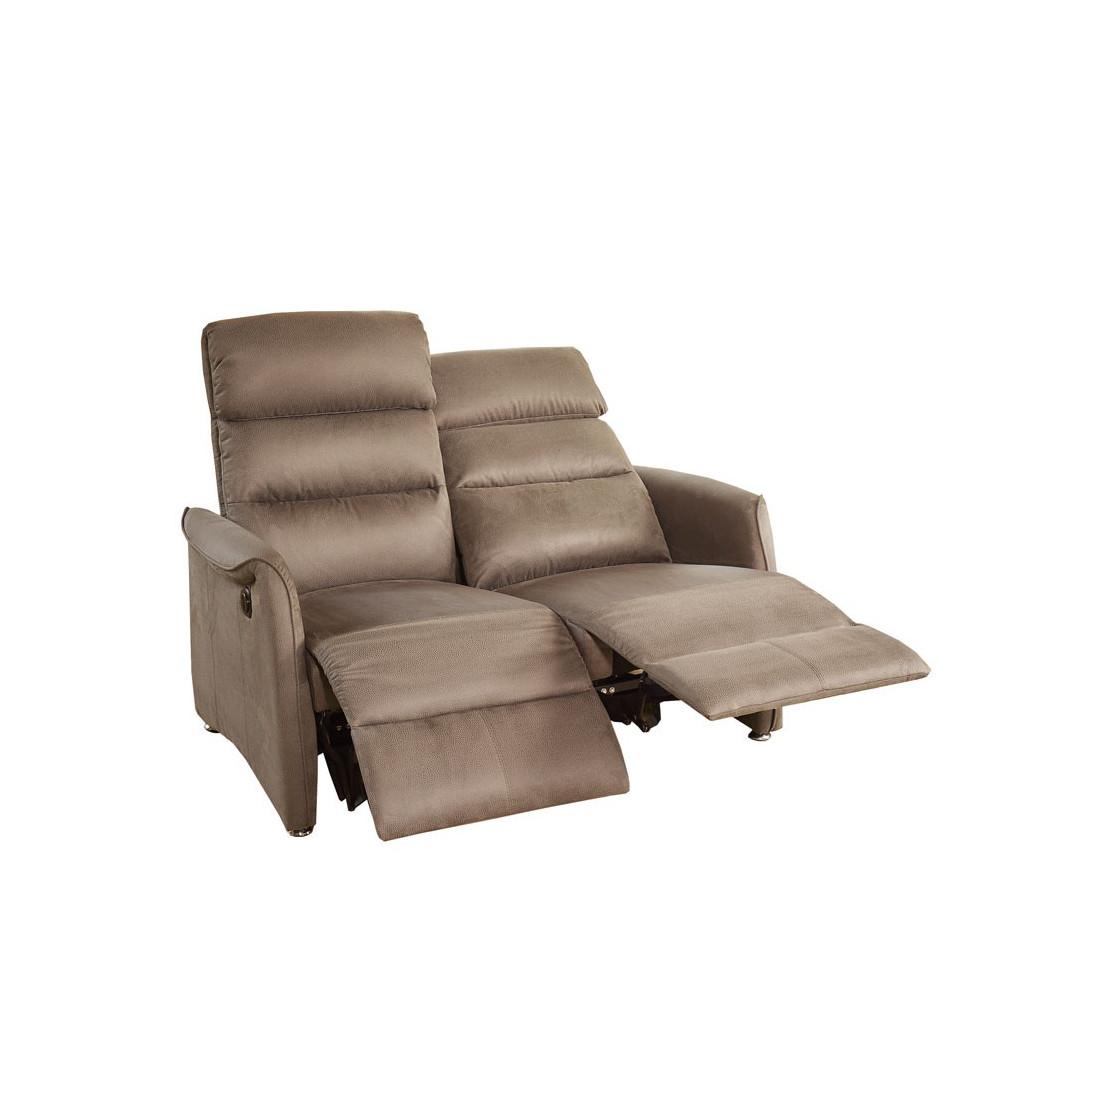 Canap relax el 2p marron cendr softy univers salon - Canape relax 2 places ...